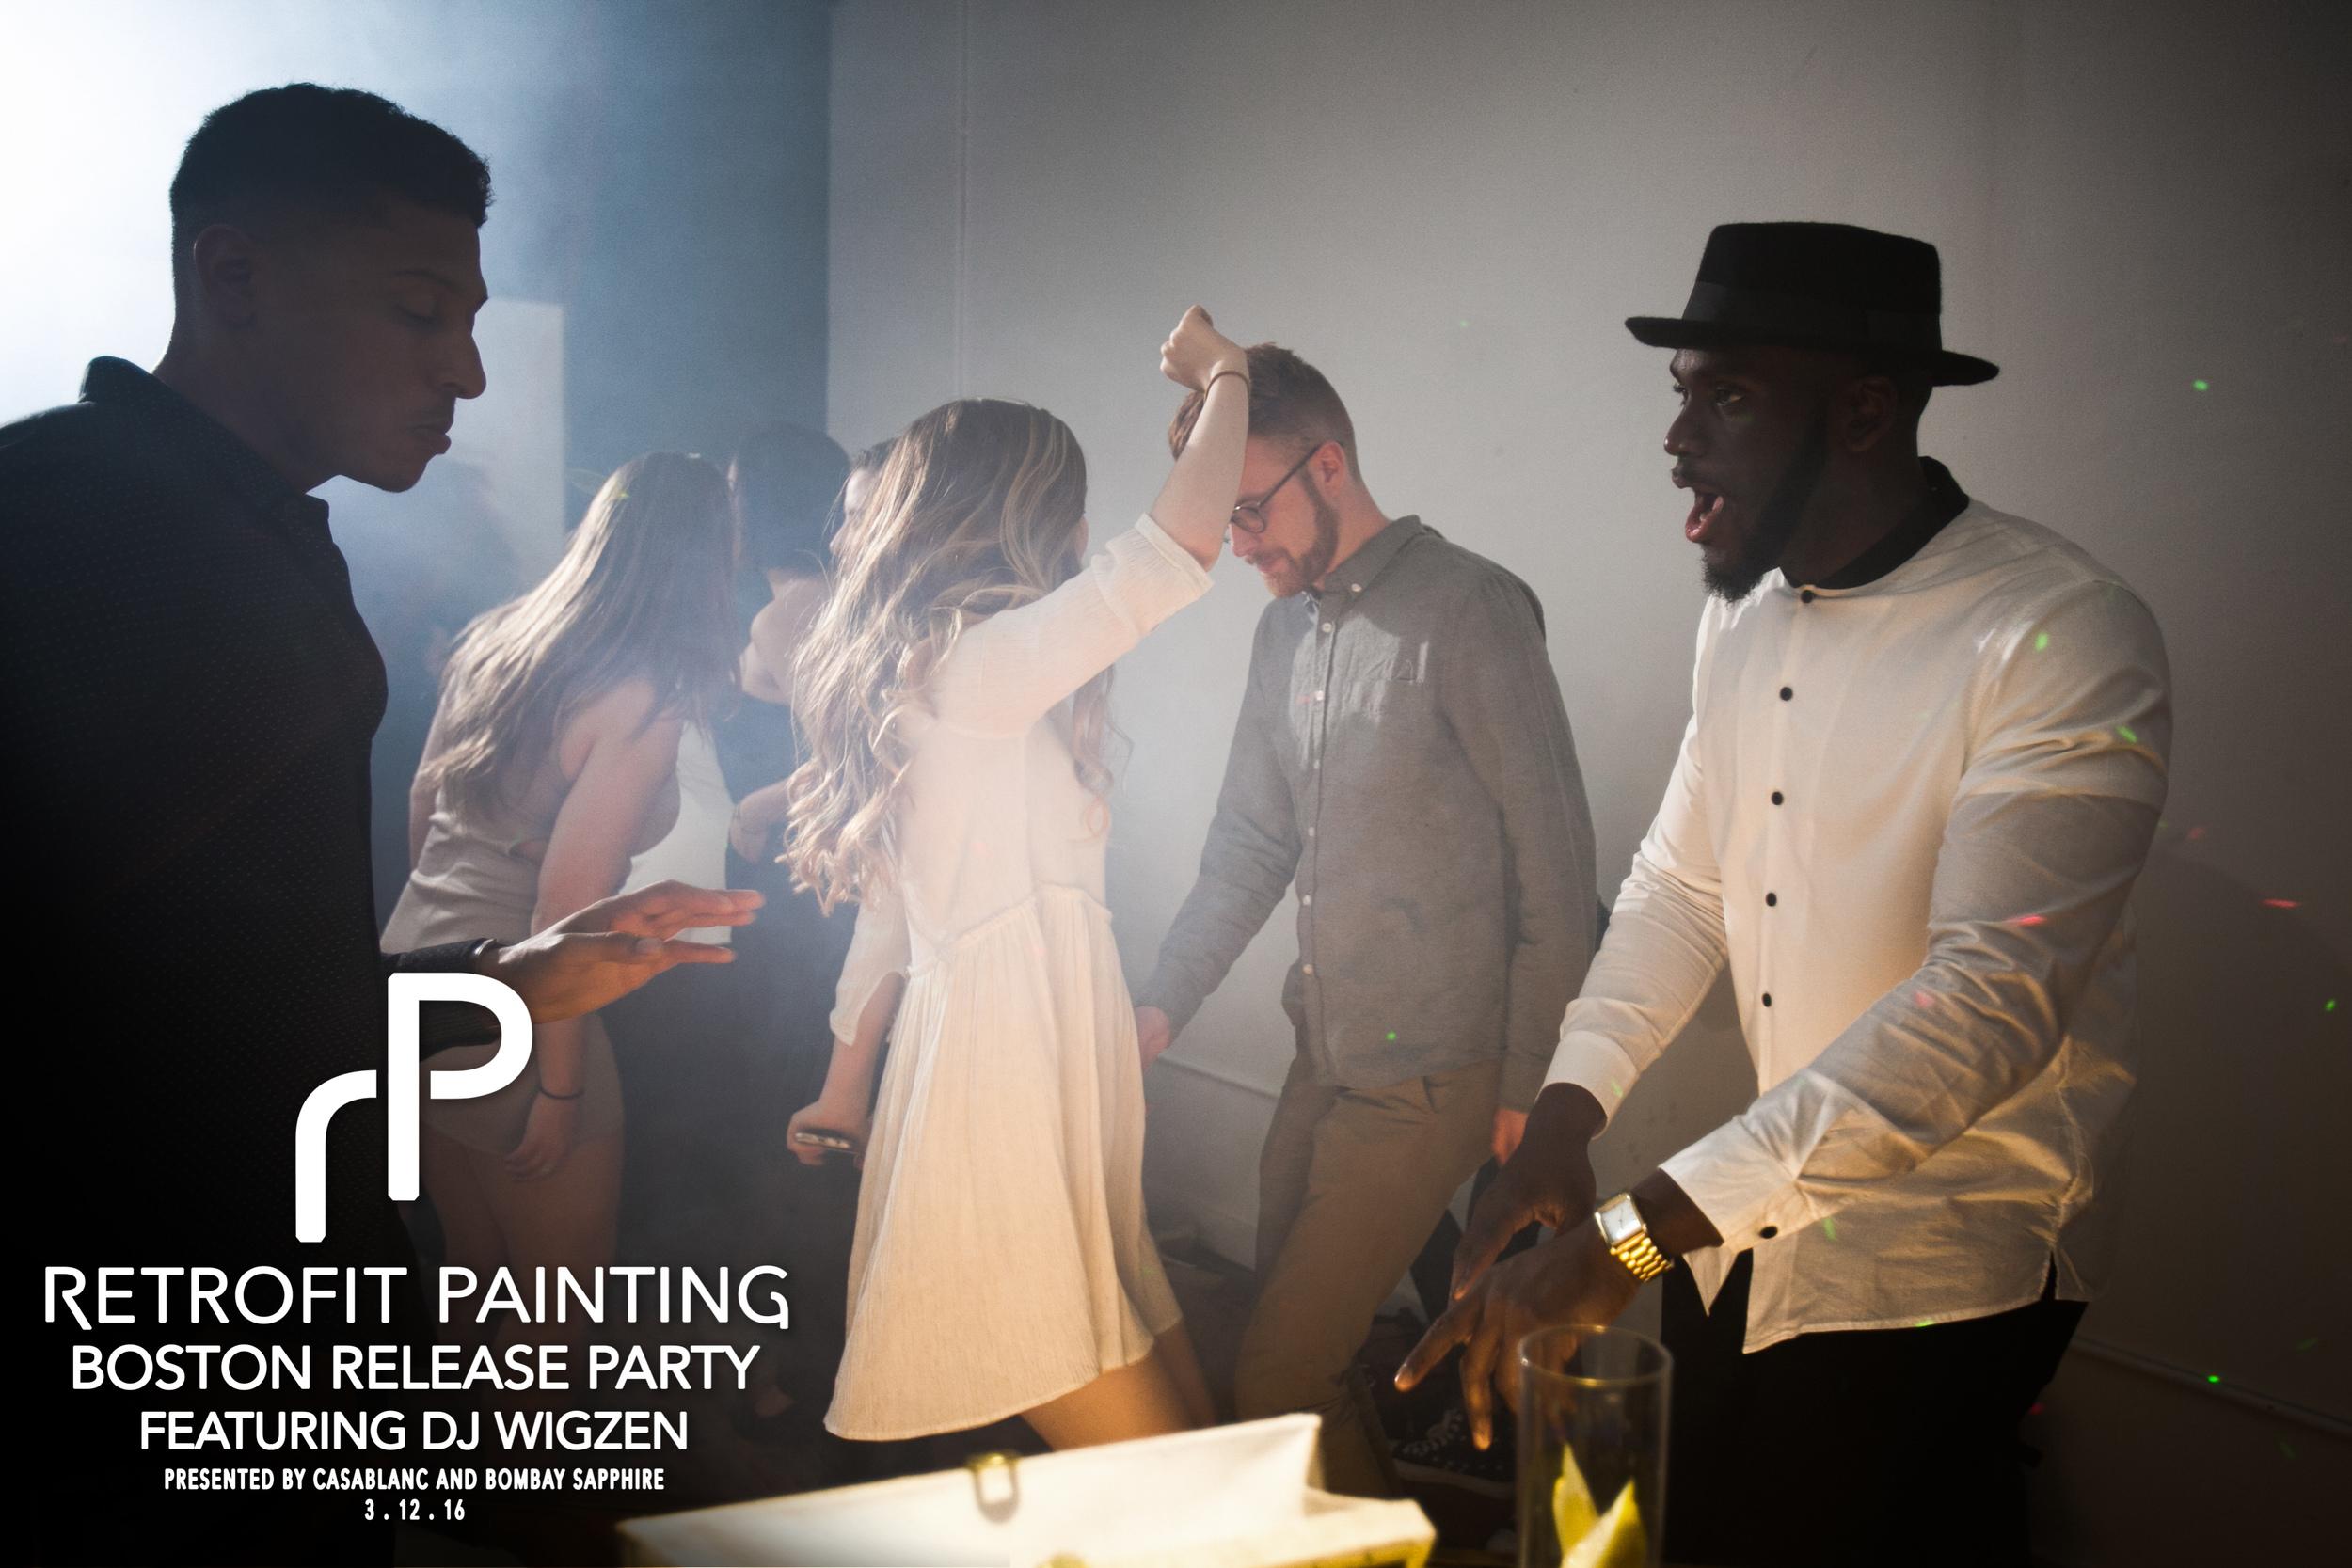 Retrofit Painting Boston Release Party 0177.jpg